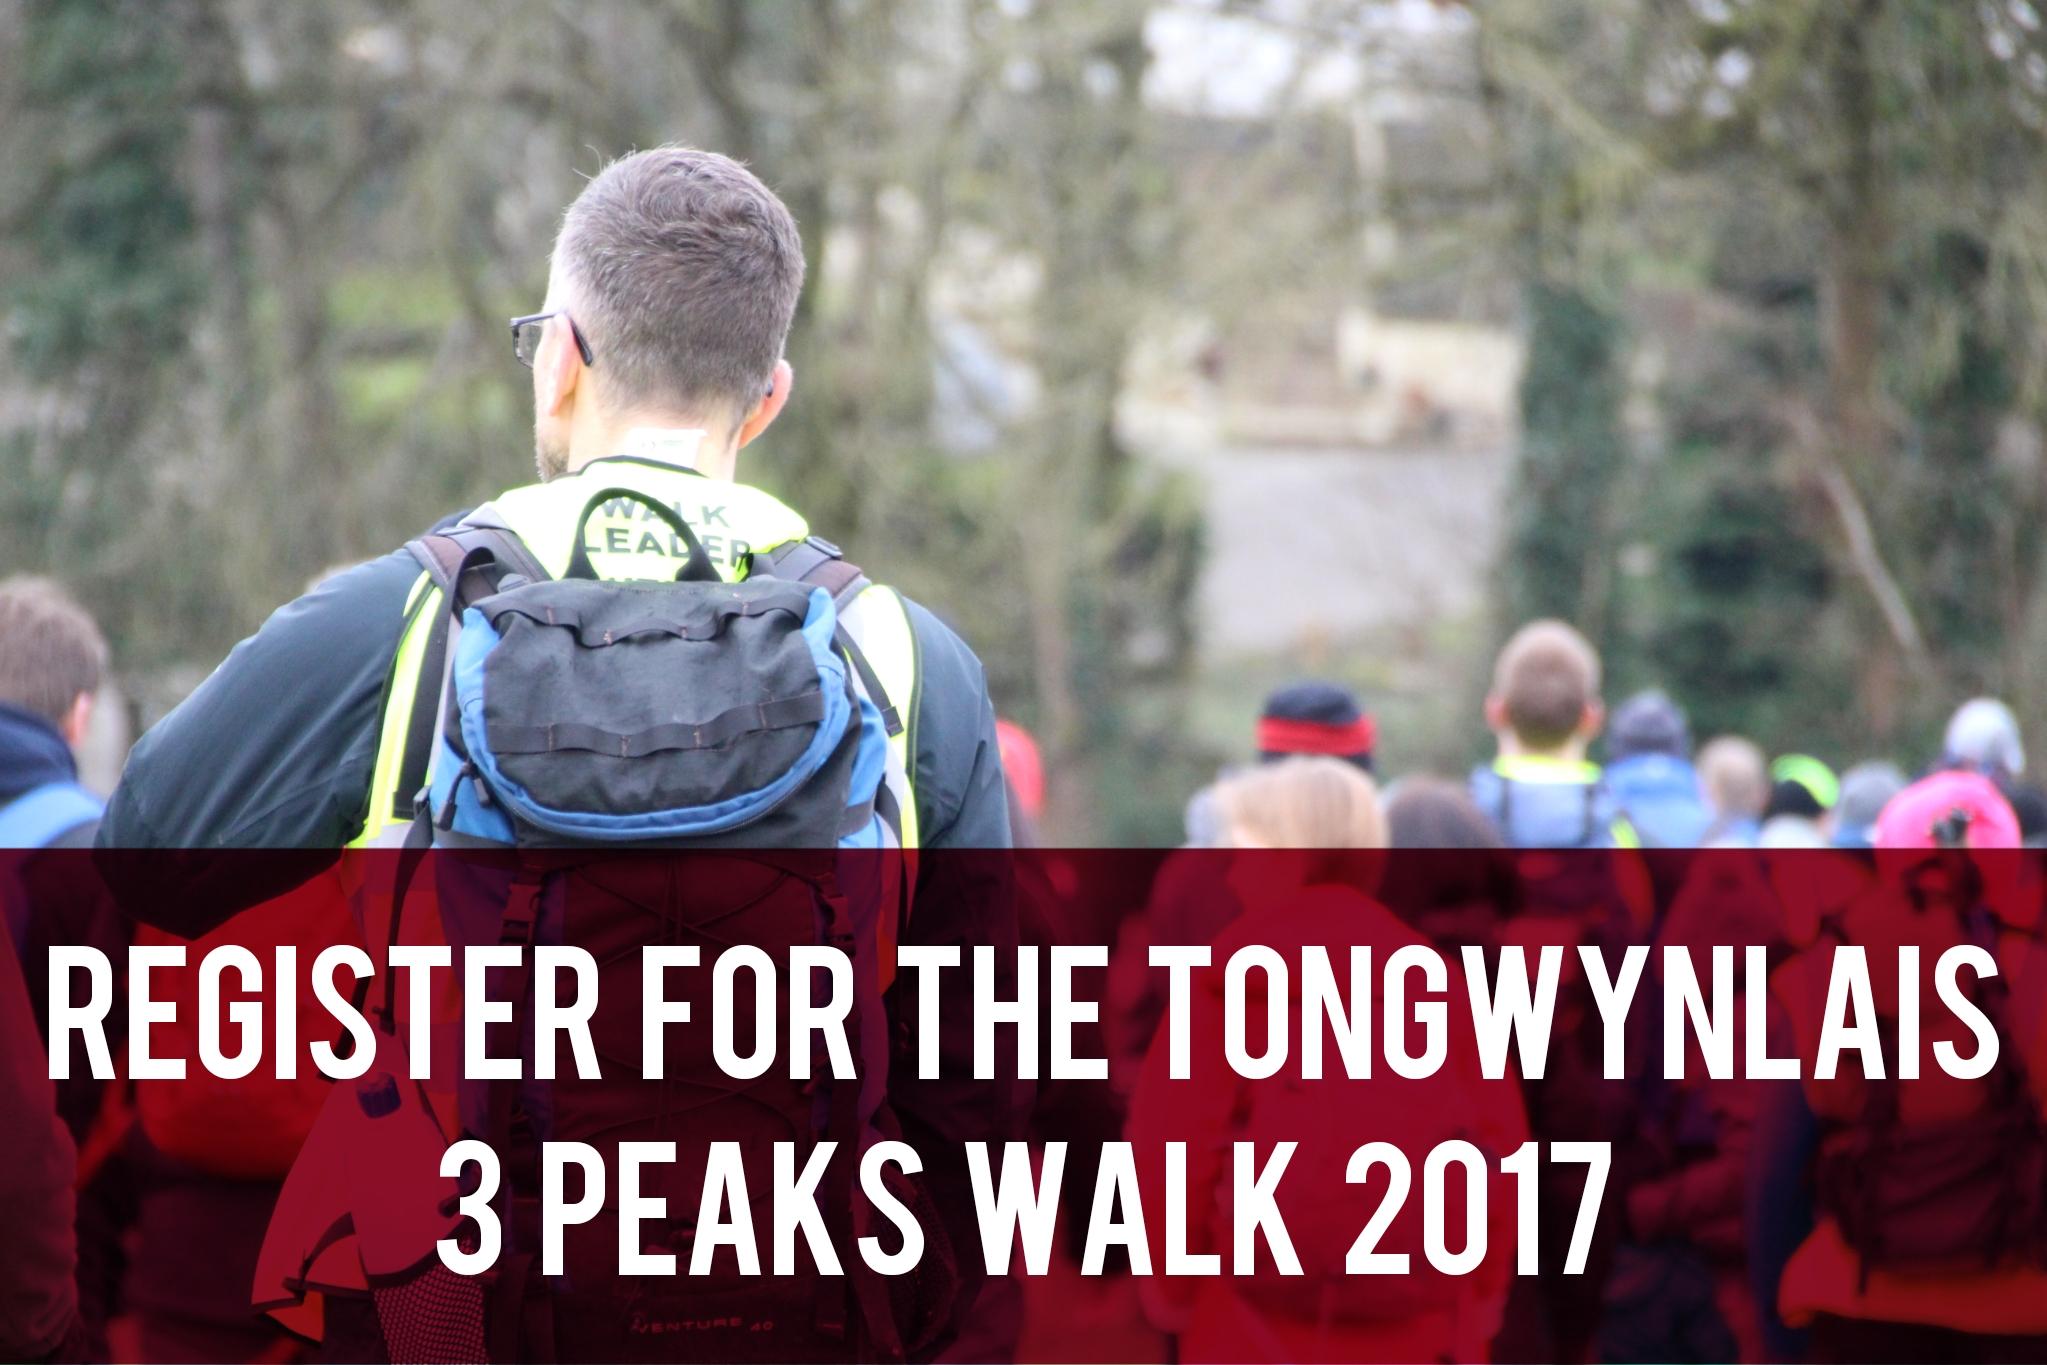 Register for the Tongwynlais 3 Peaks Walk 2017